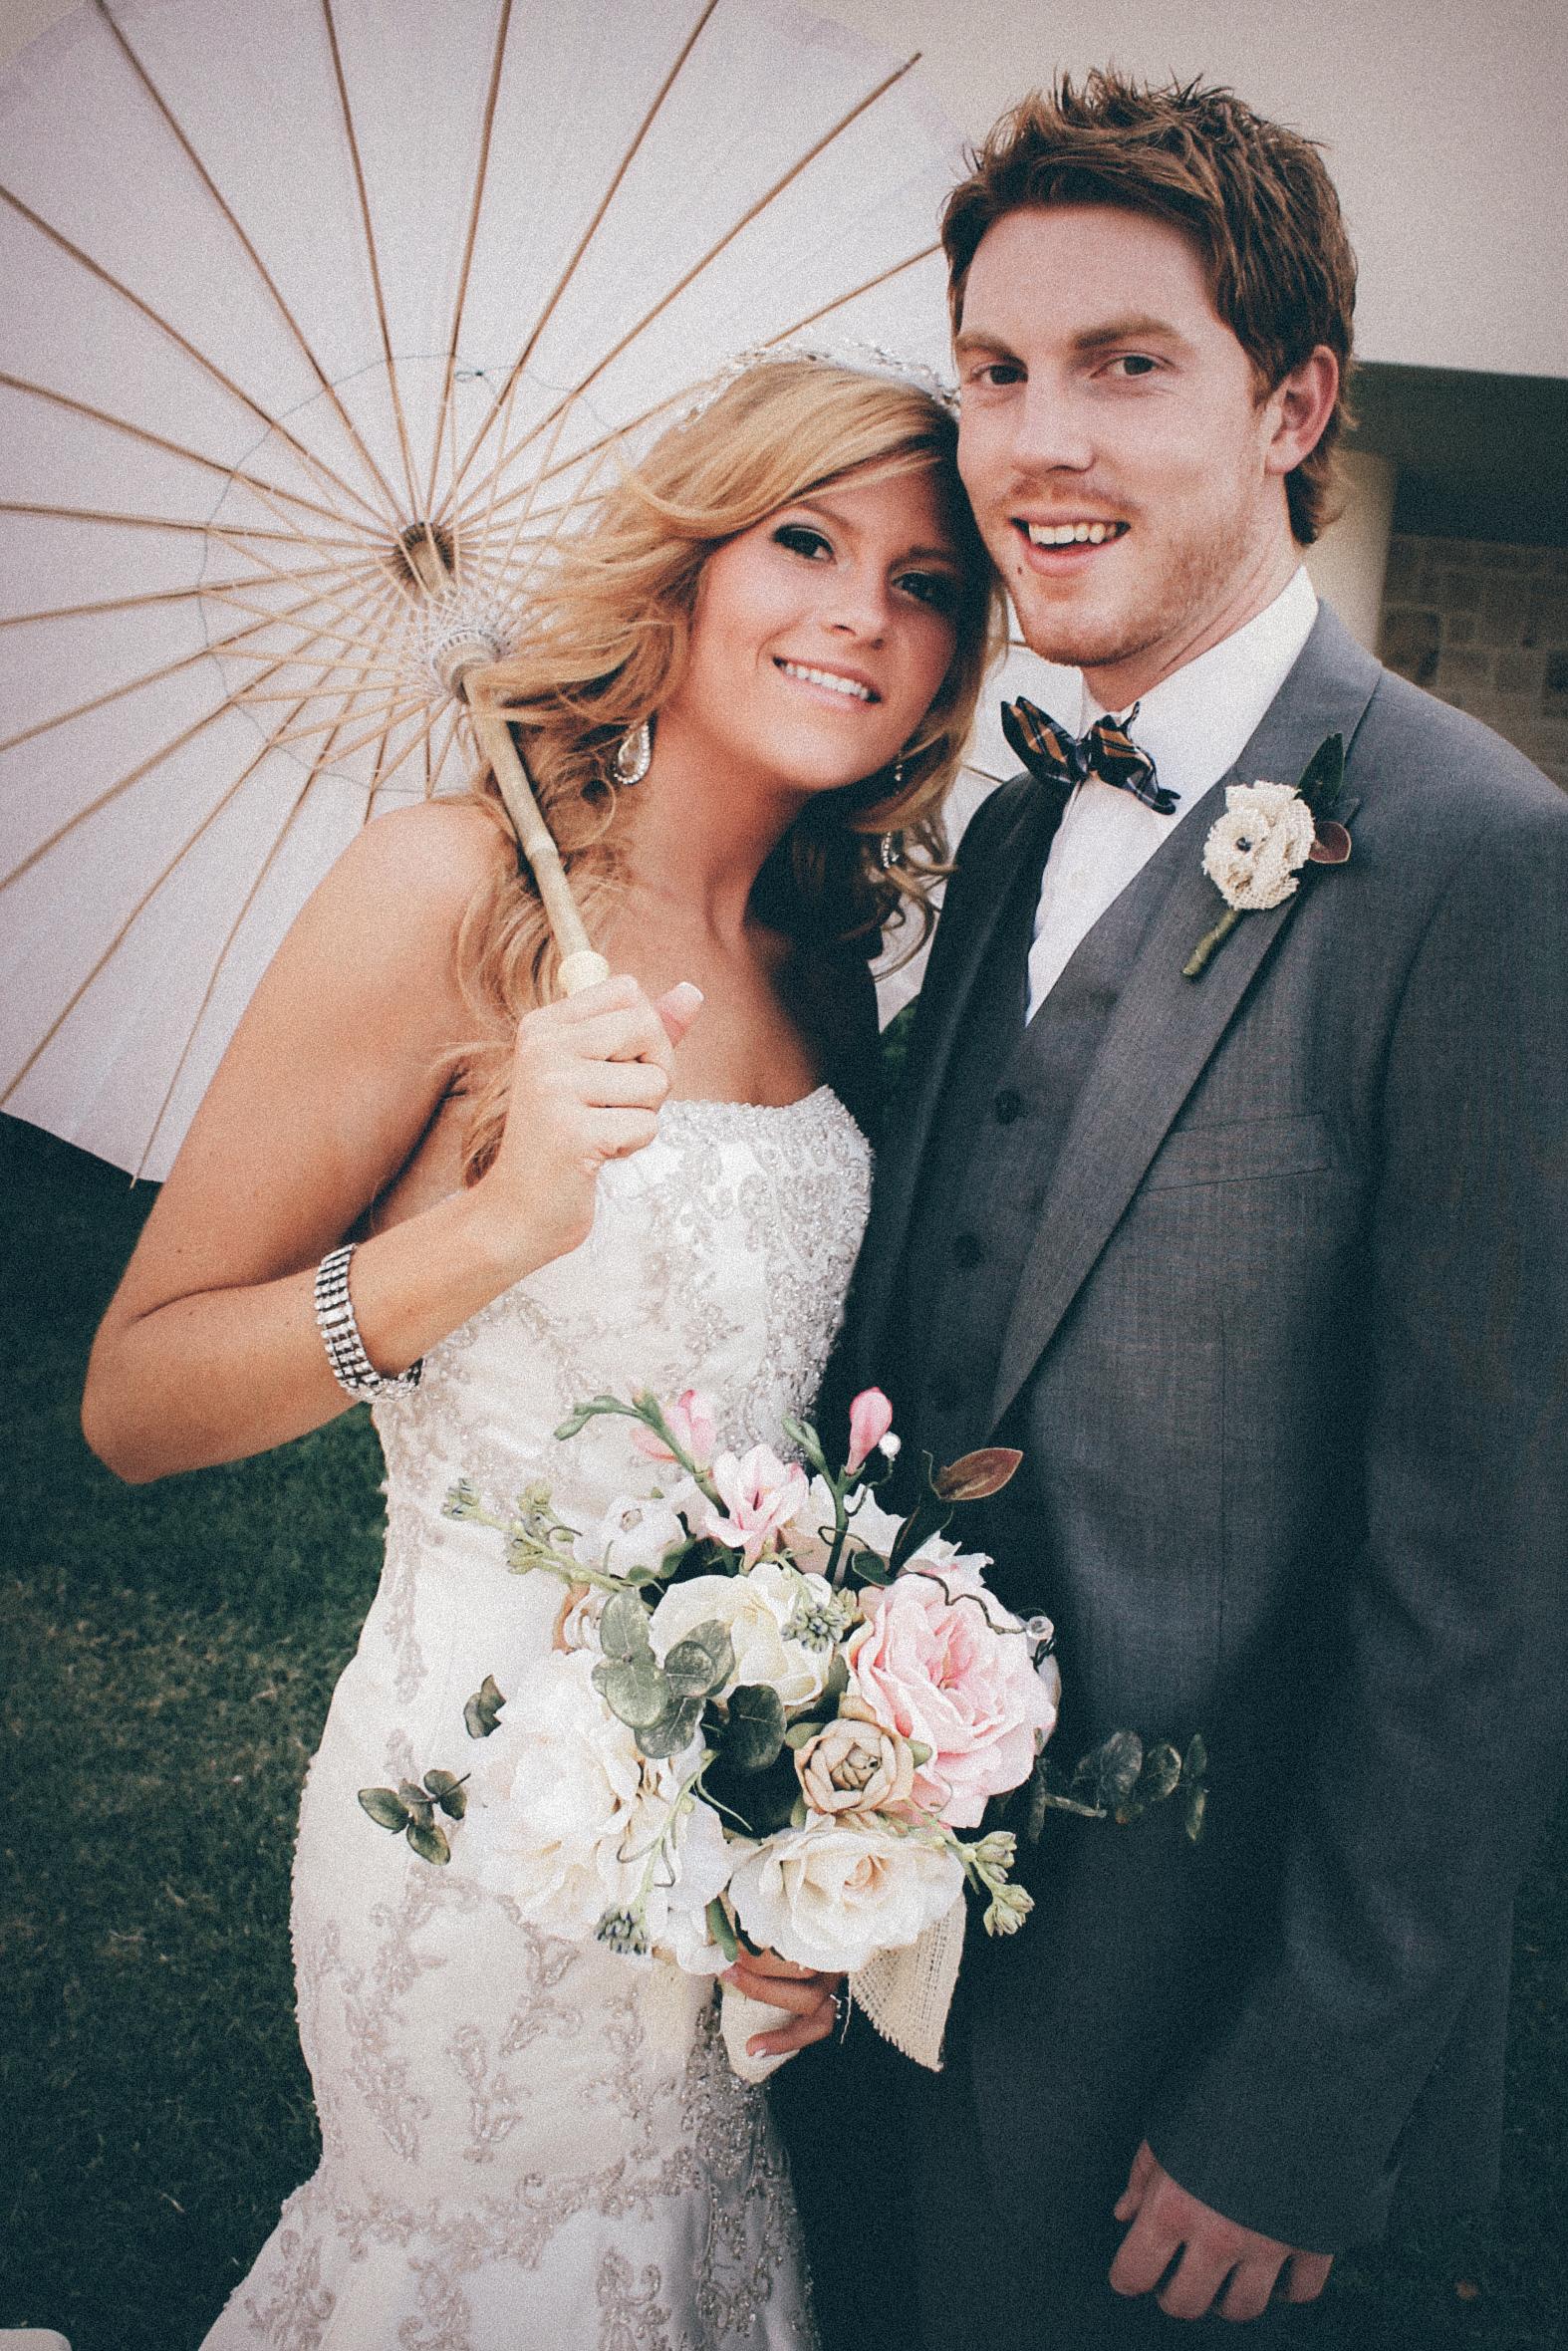 Daniel and Sam Mow Wedding Tulsa | The Picture People LA | Christi Childs (9 of 22).jpg